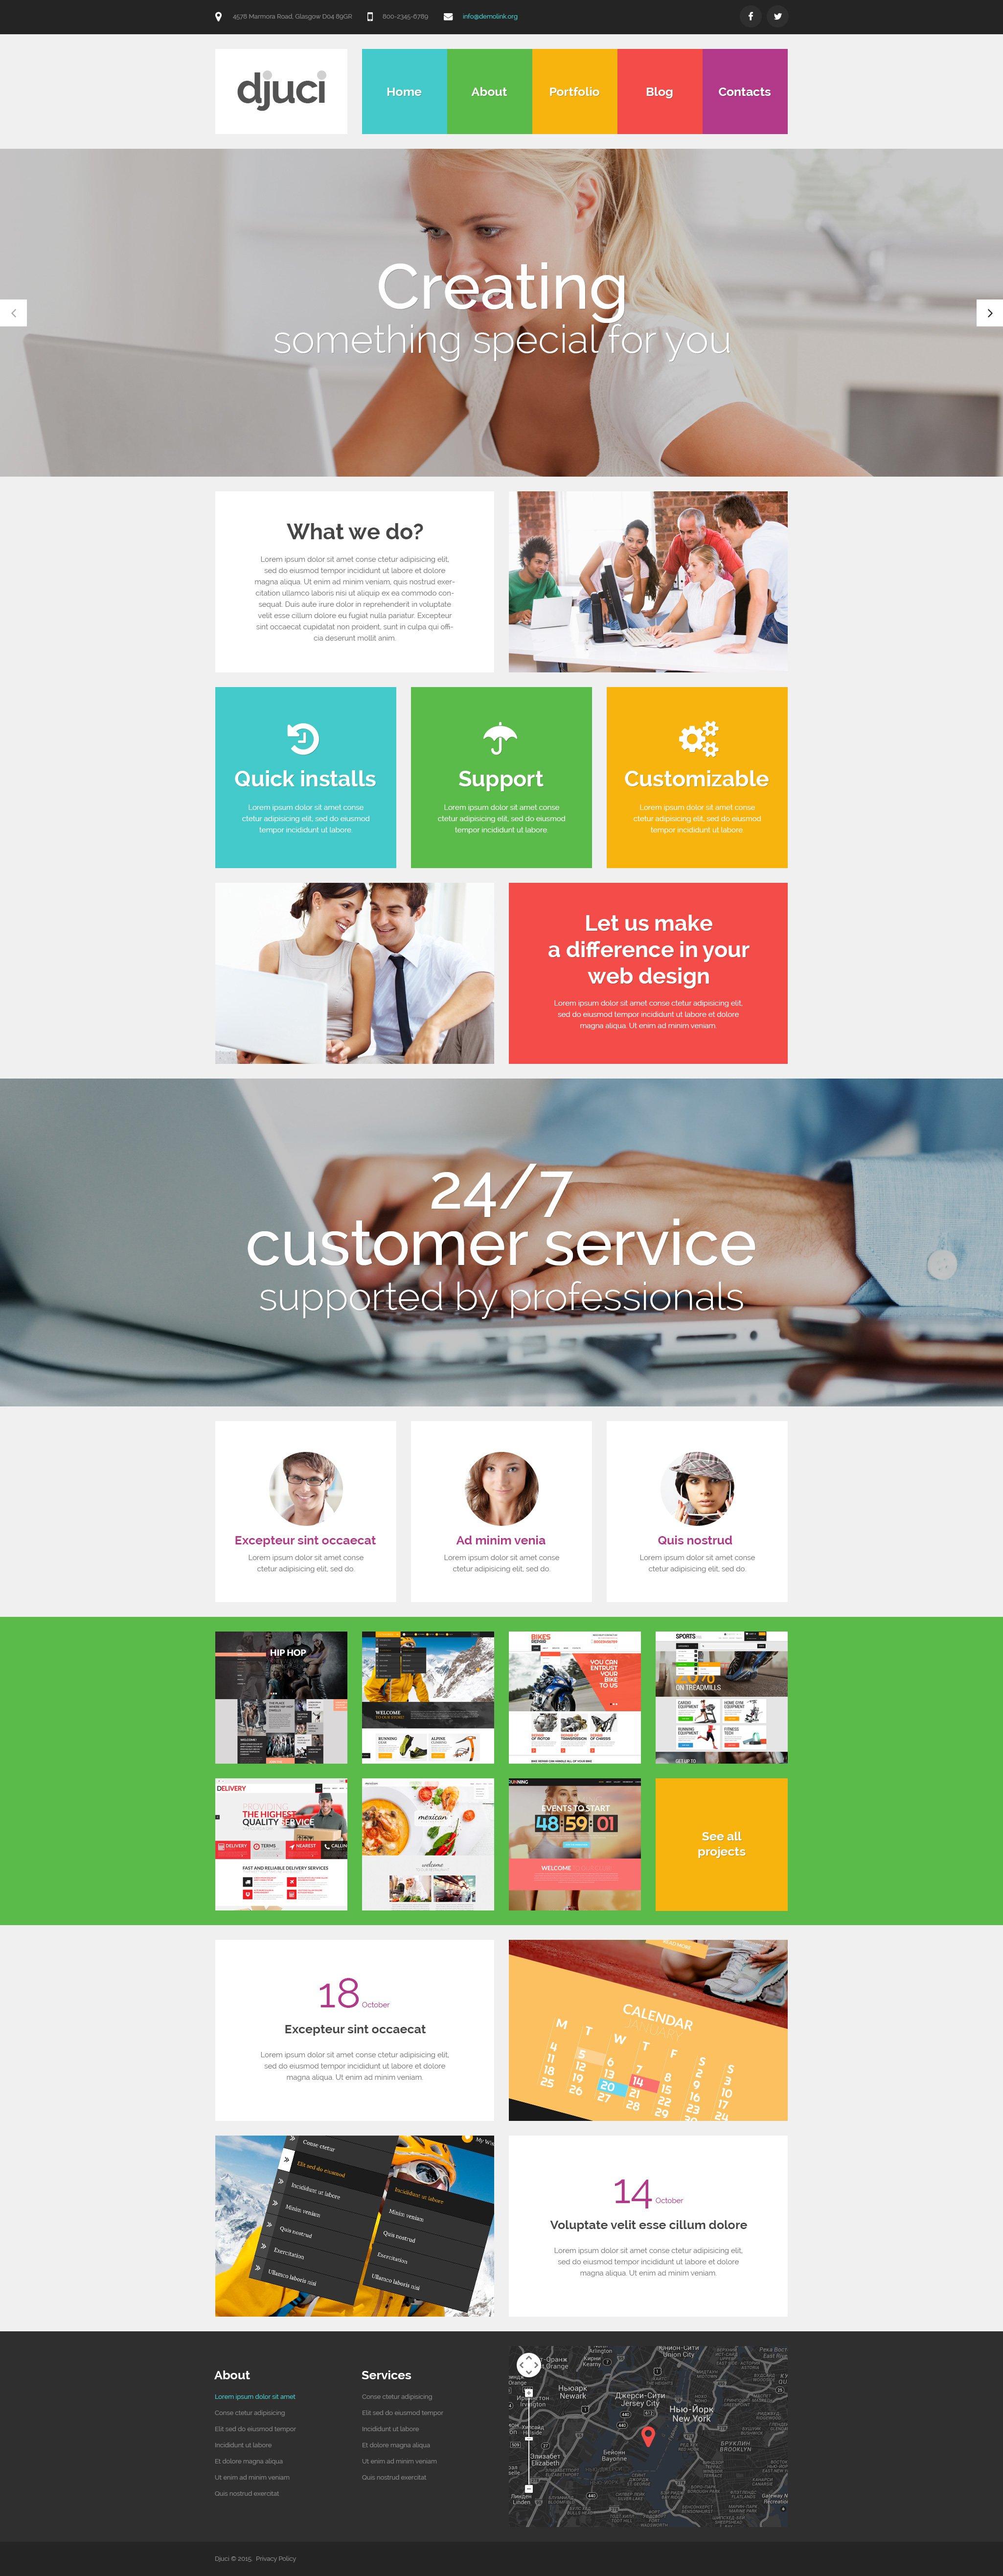 Responsive Web Design Wordpress #53095 - Ekran resmi